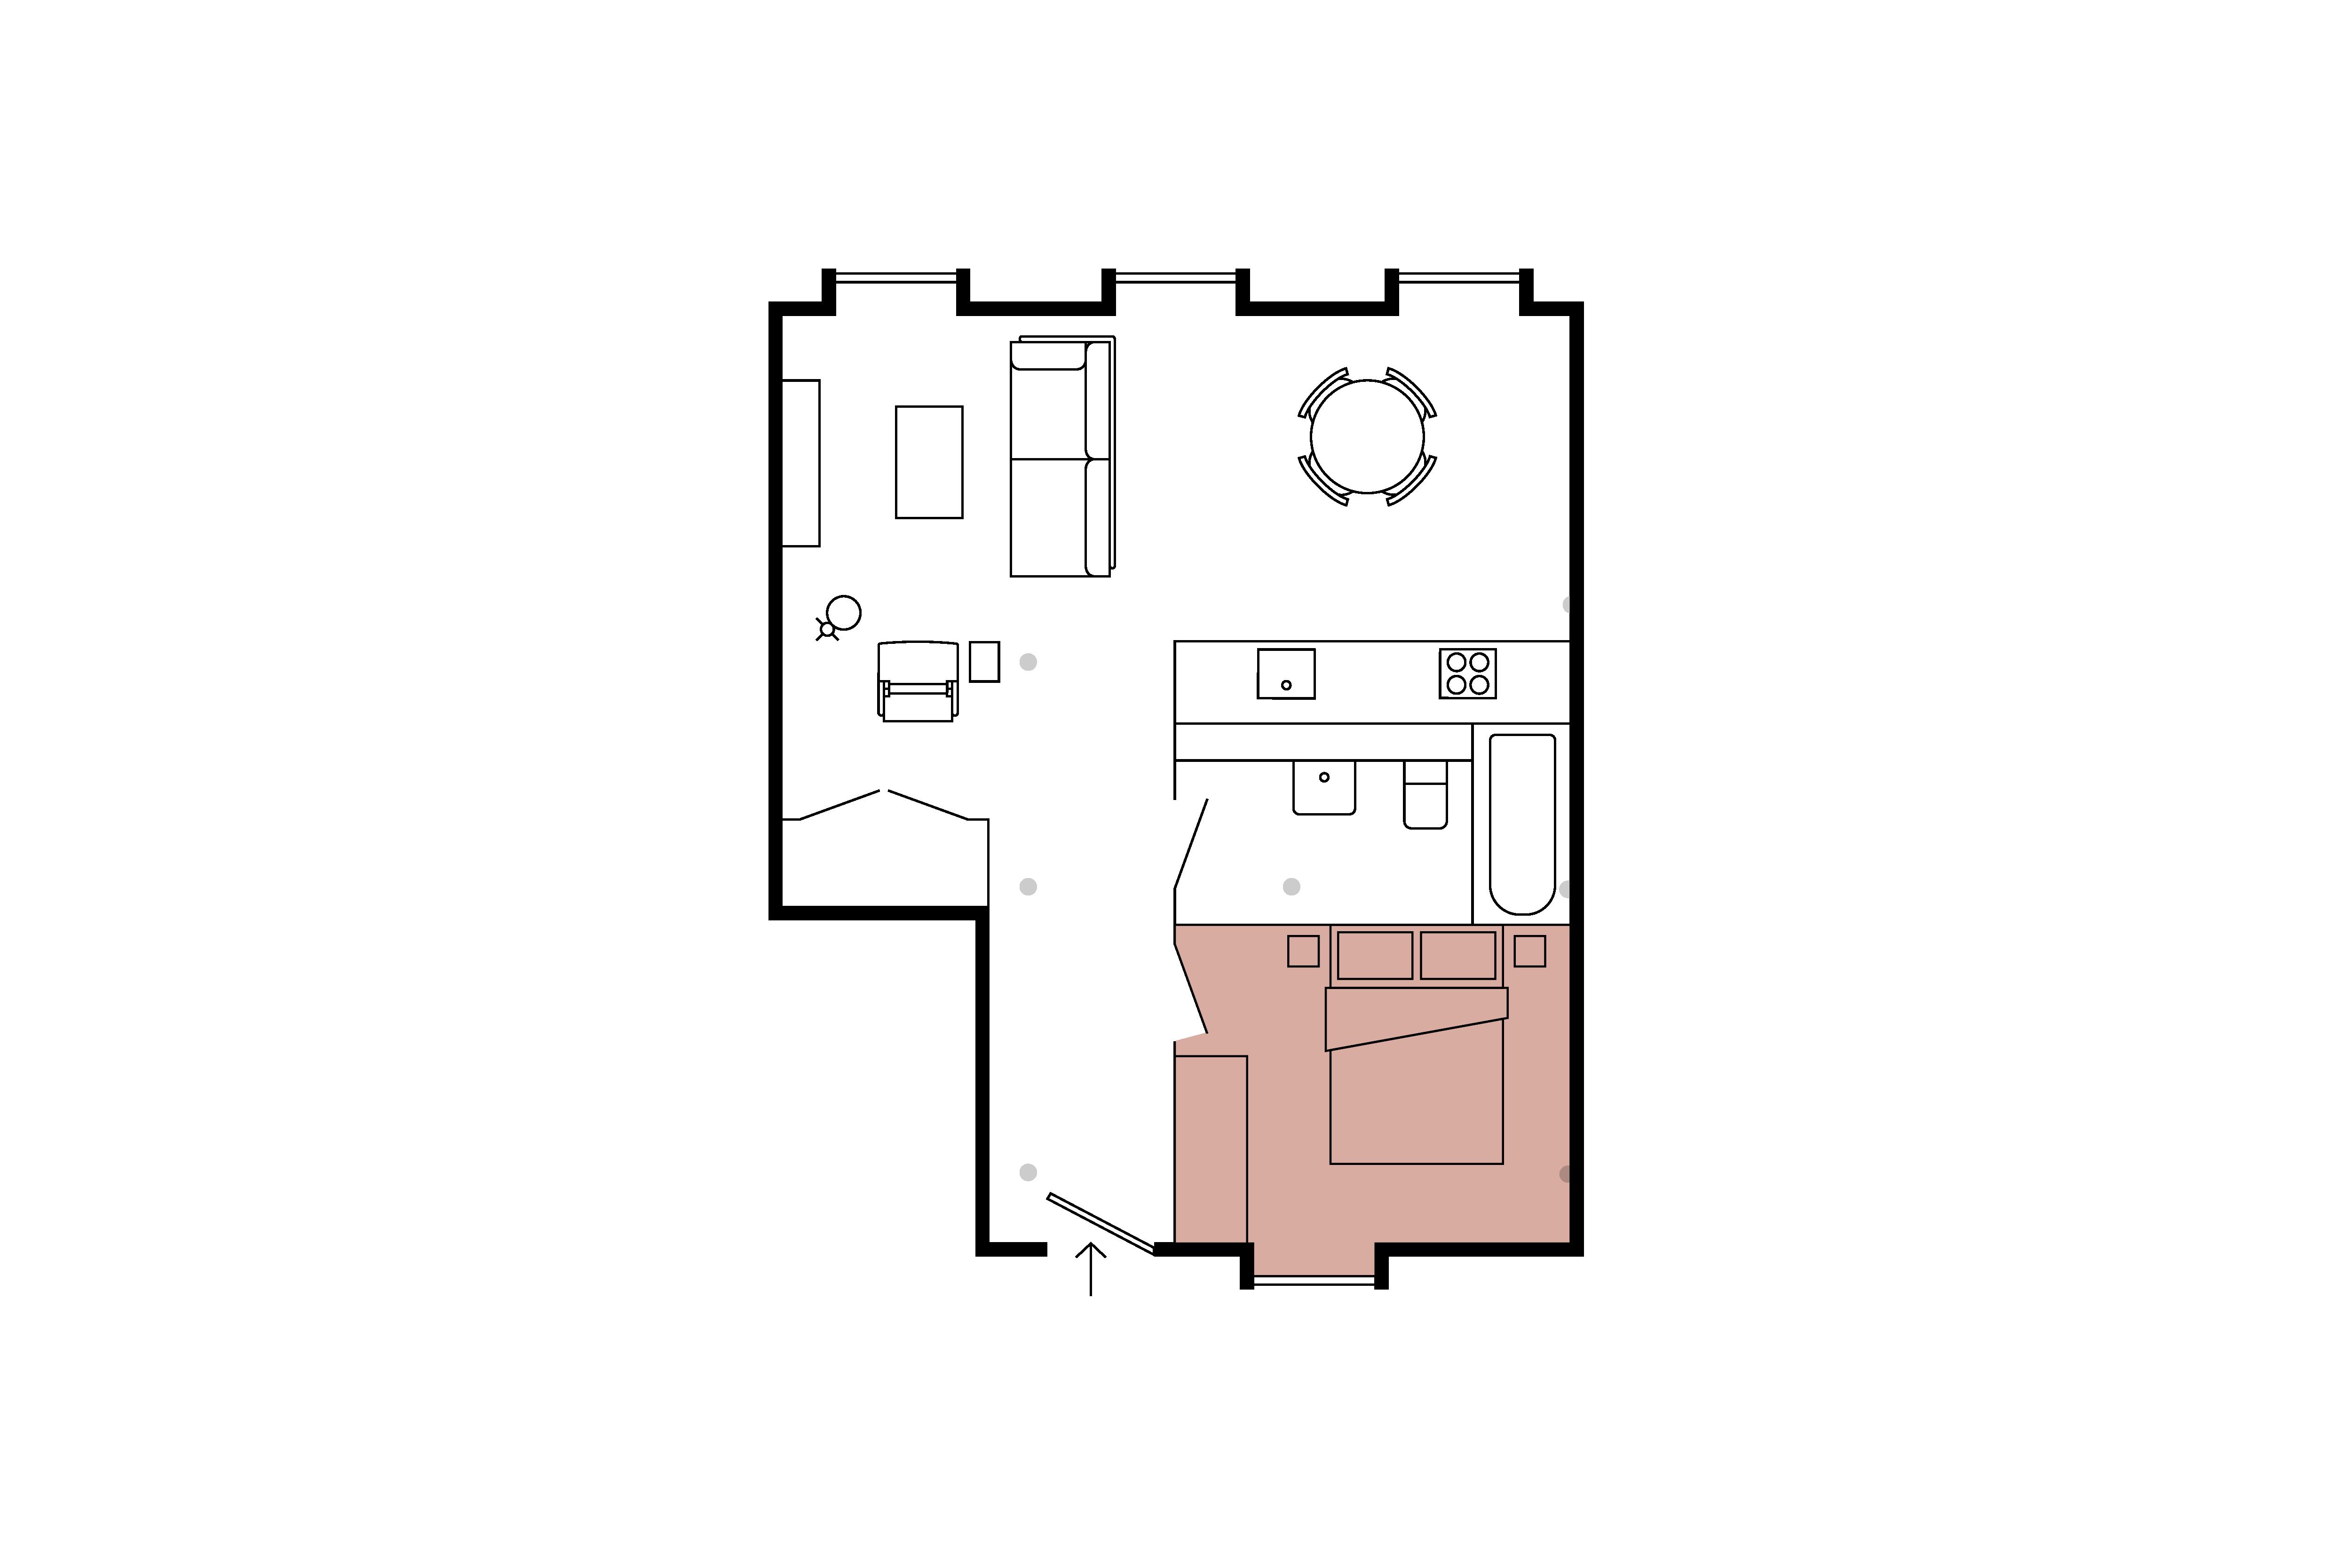 Floor plan for 1 Bed – Minto & Turner